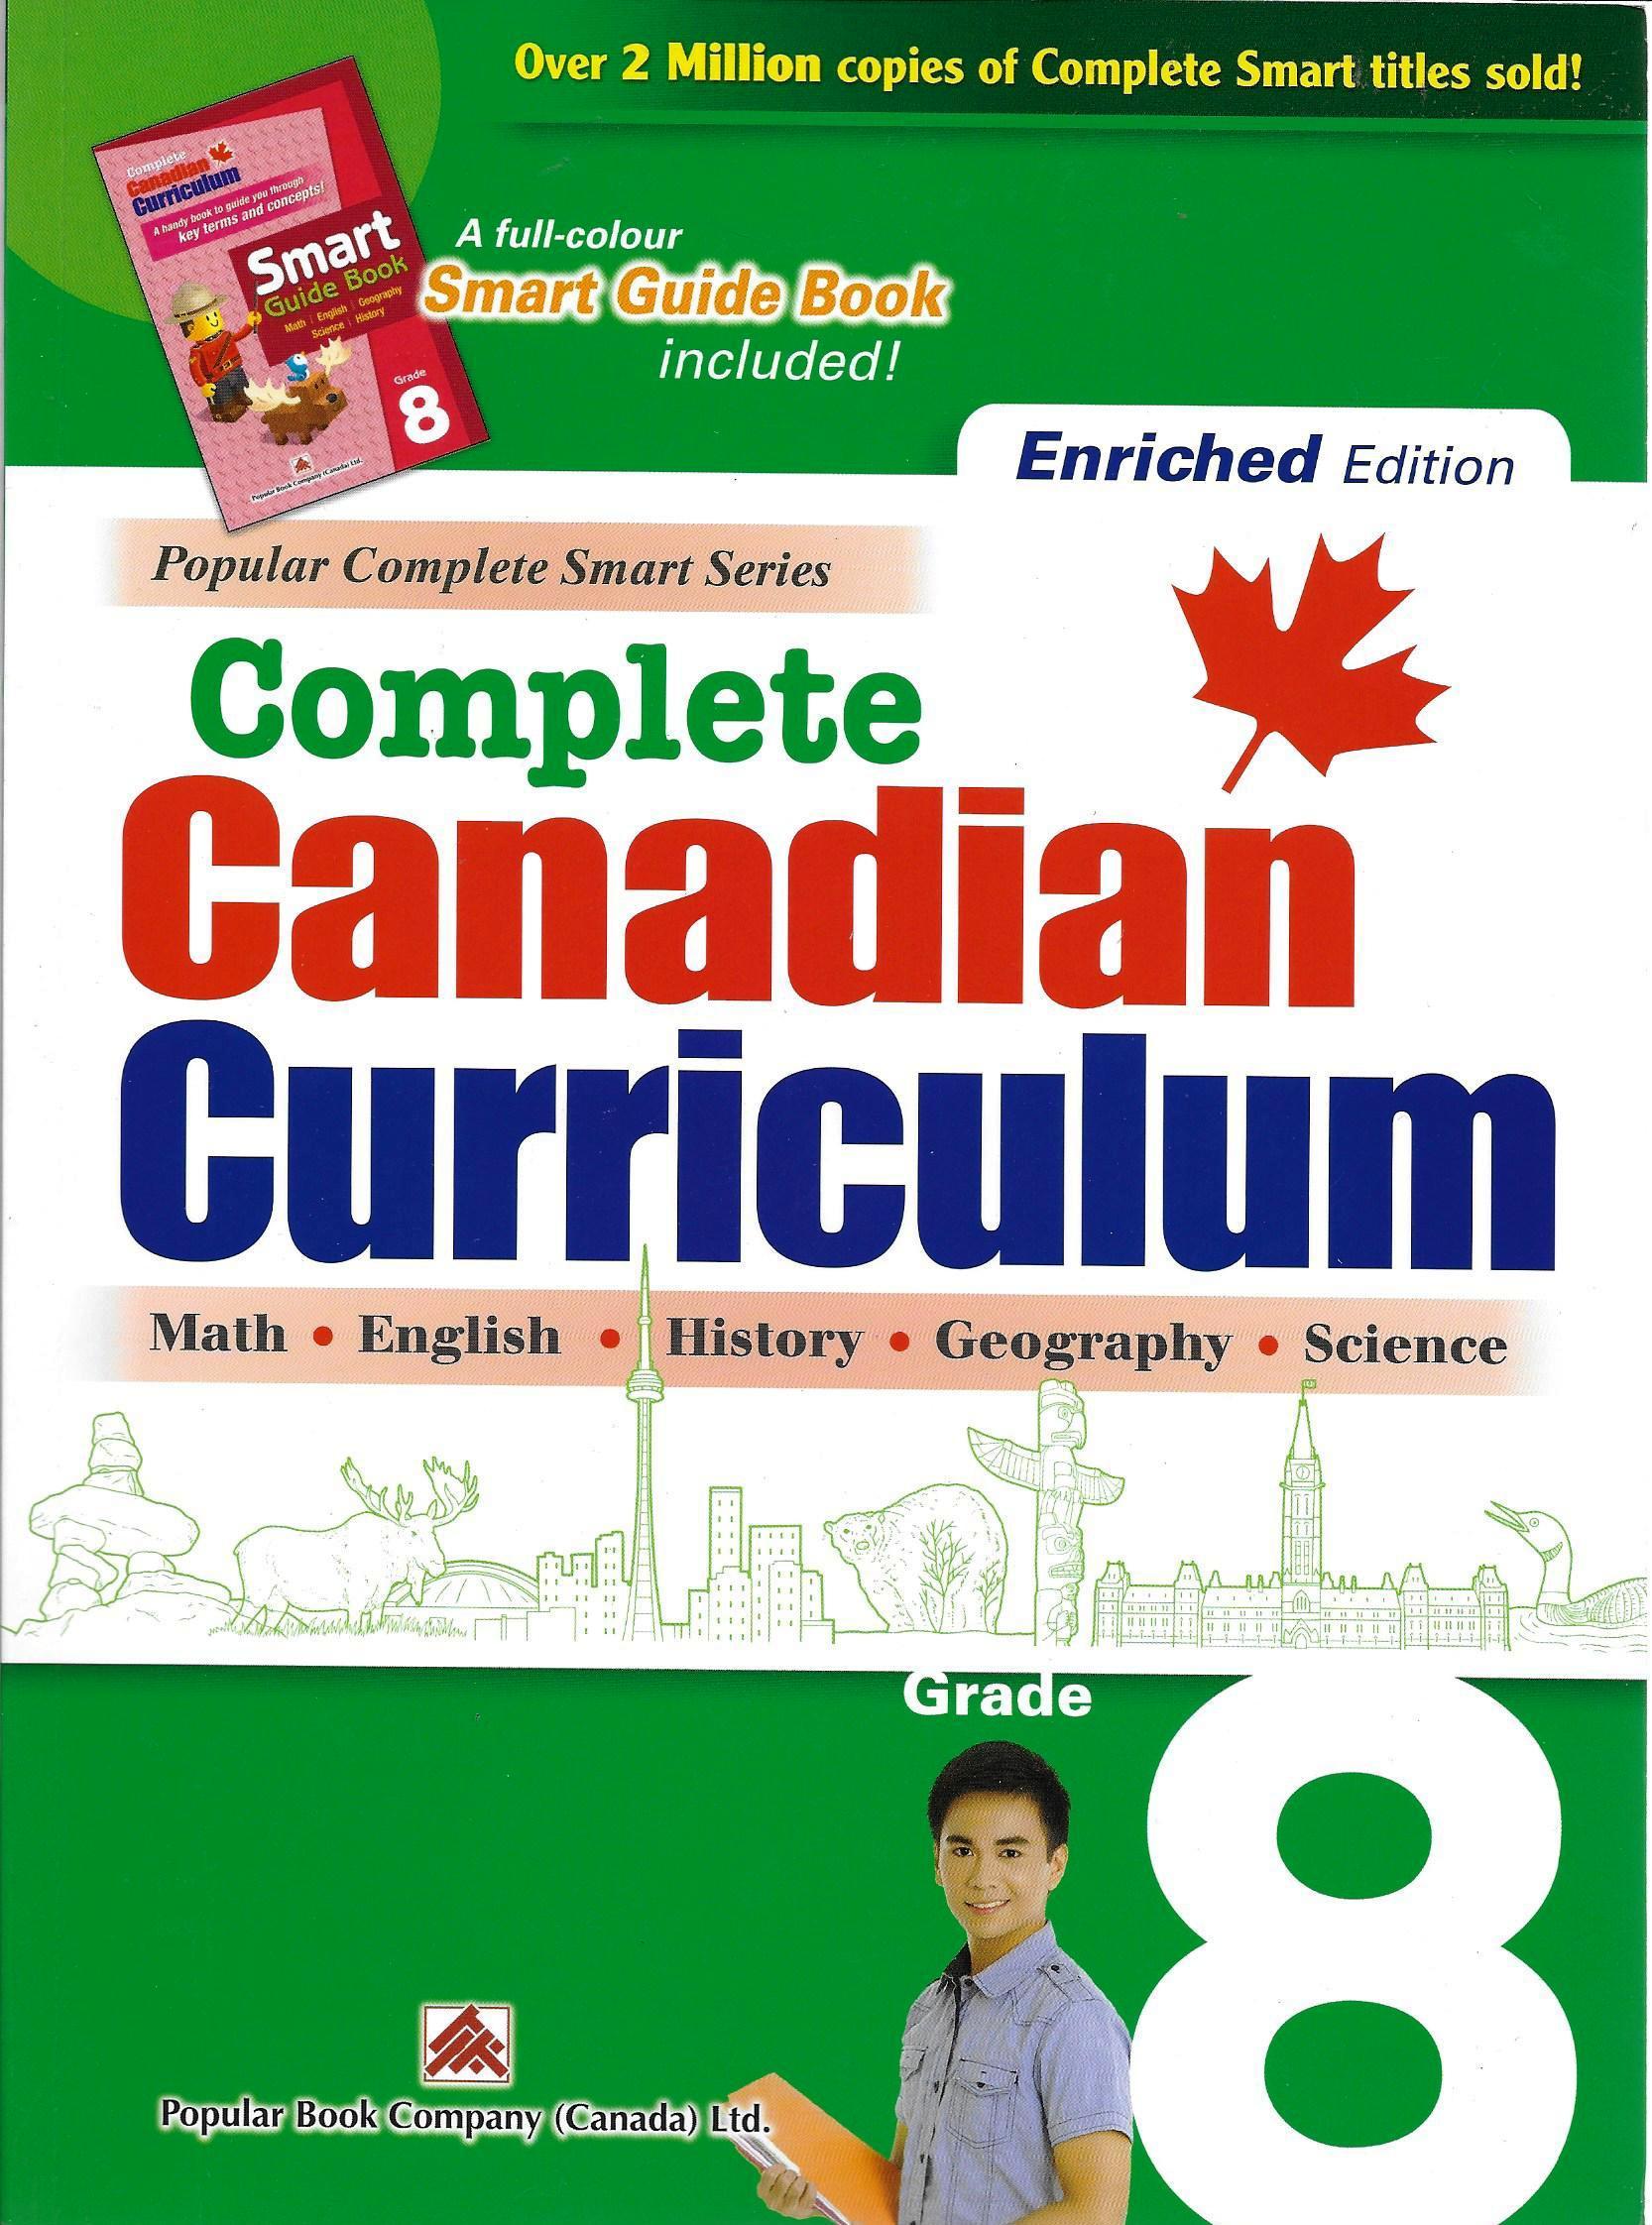 Middle Grades Science Education Emporium